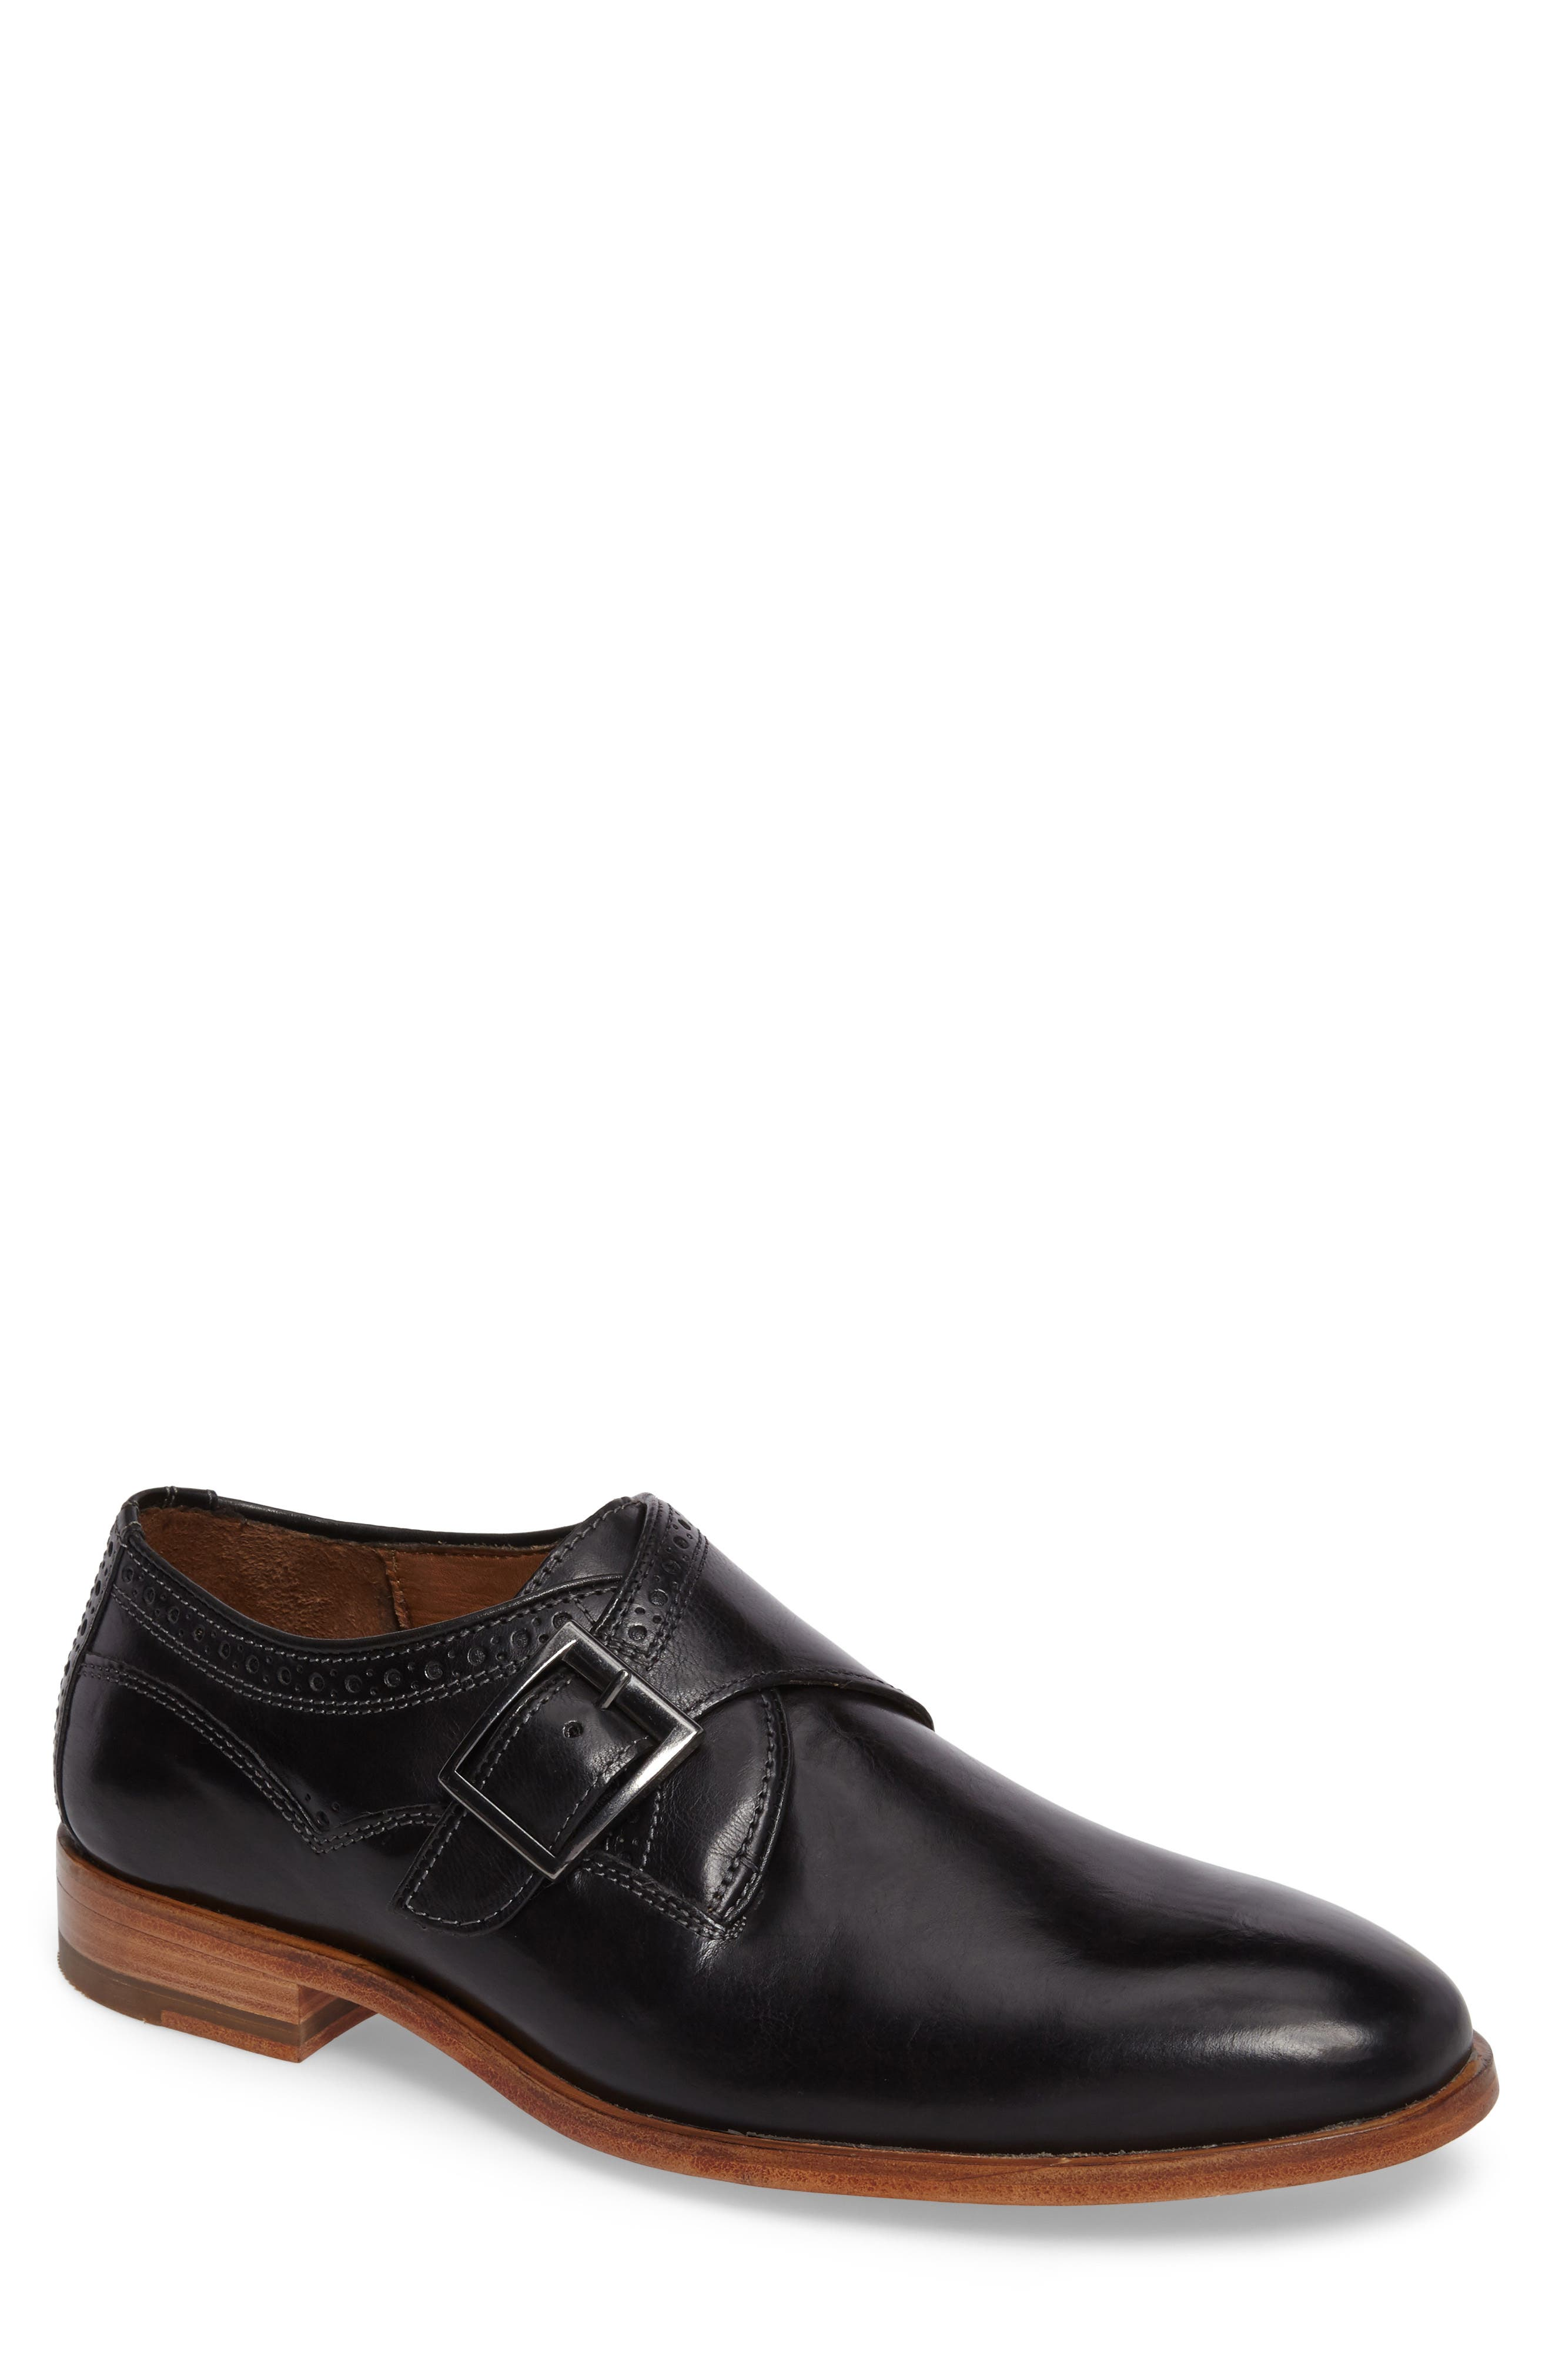 Alternate Image 1 Selected - J&M 1850 Graham Monk Strap Shoe (Men)